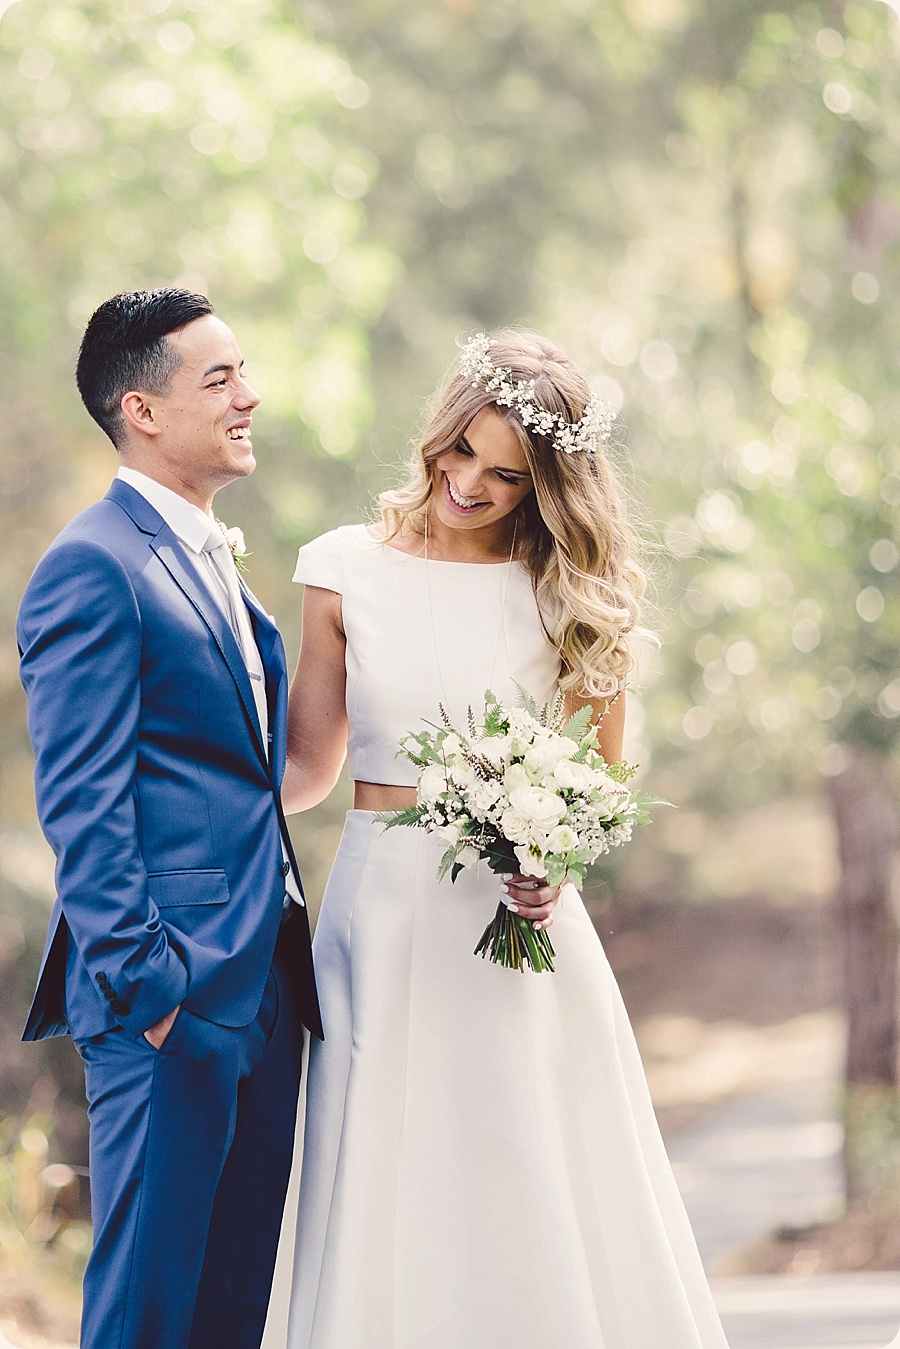 backyard-wedding-jess-marks-photography-021.JPG